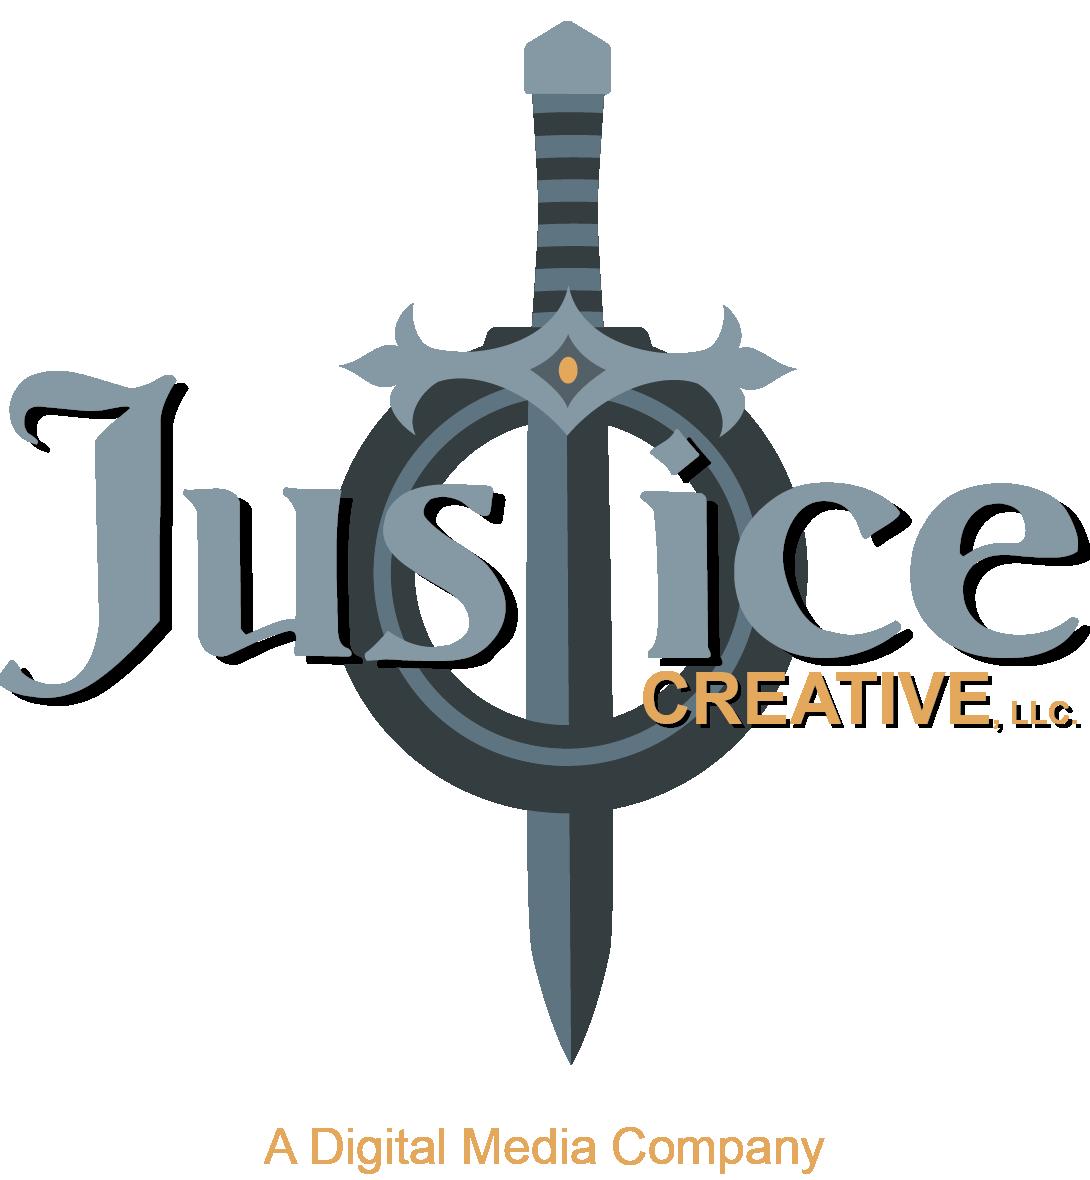 Justice Creative, LLC